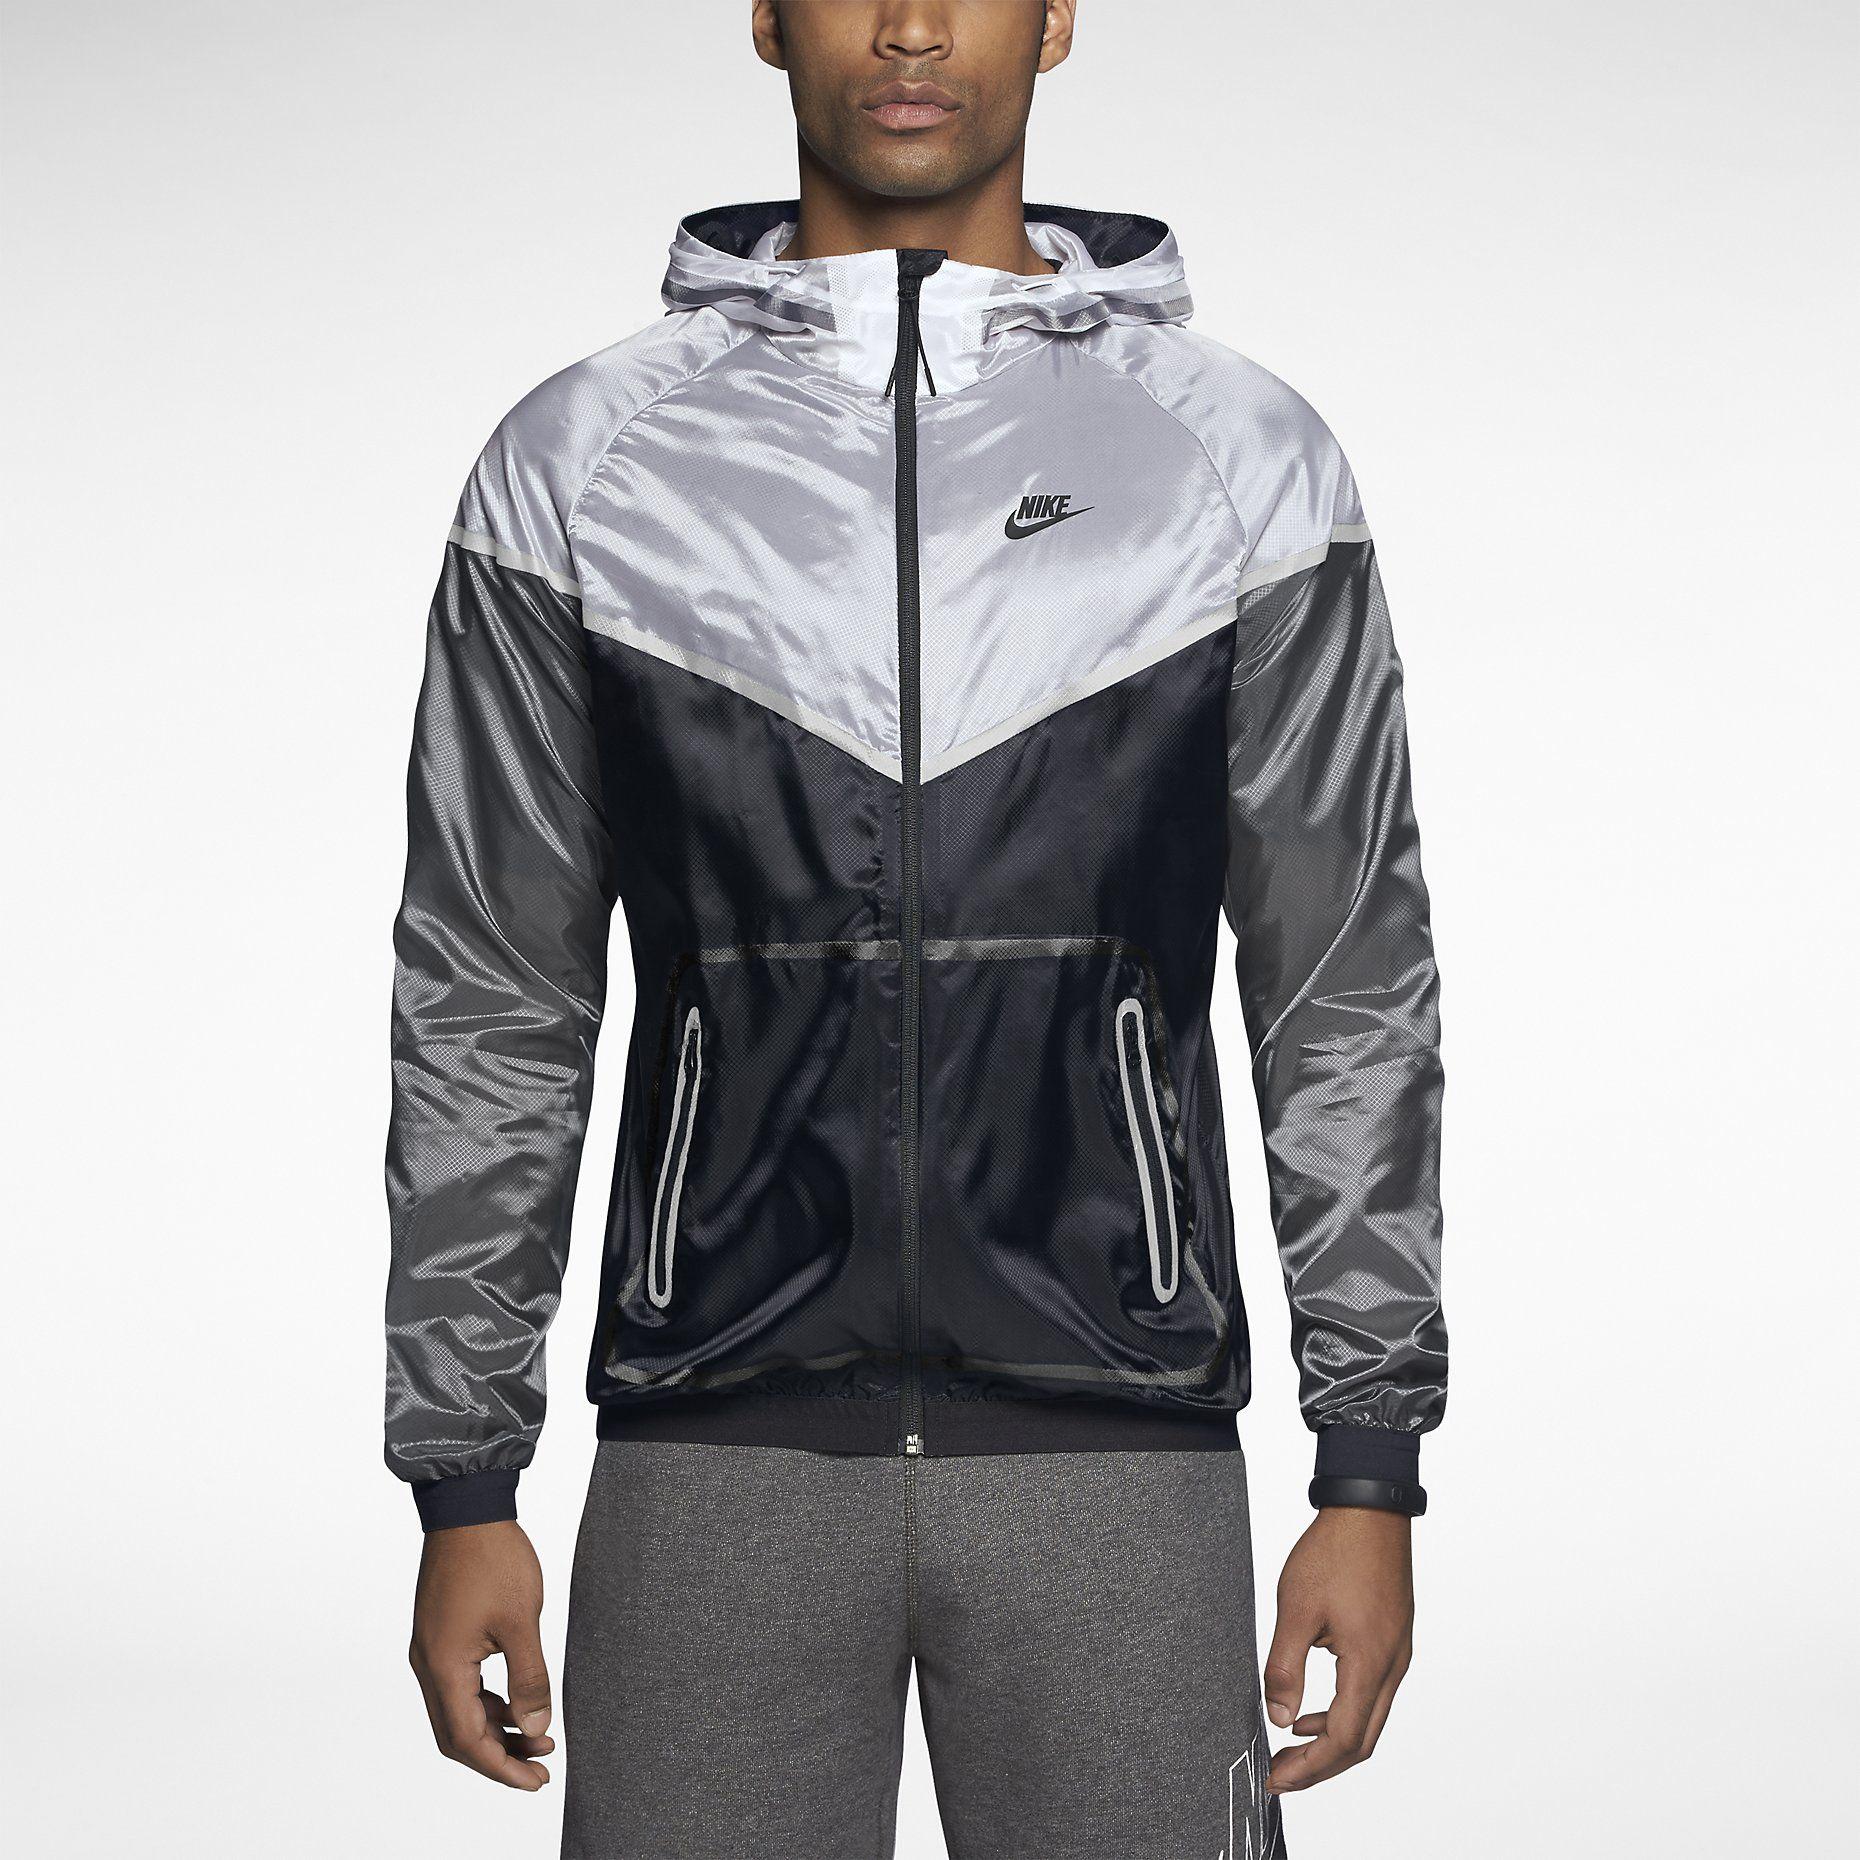 48ea16bd5 ナイキ テック ウィンドランナー メンズジャケット. Nike Store JP ...